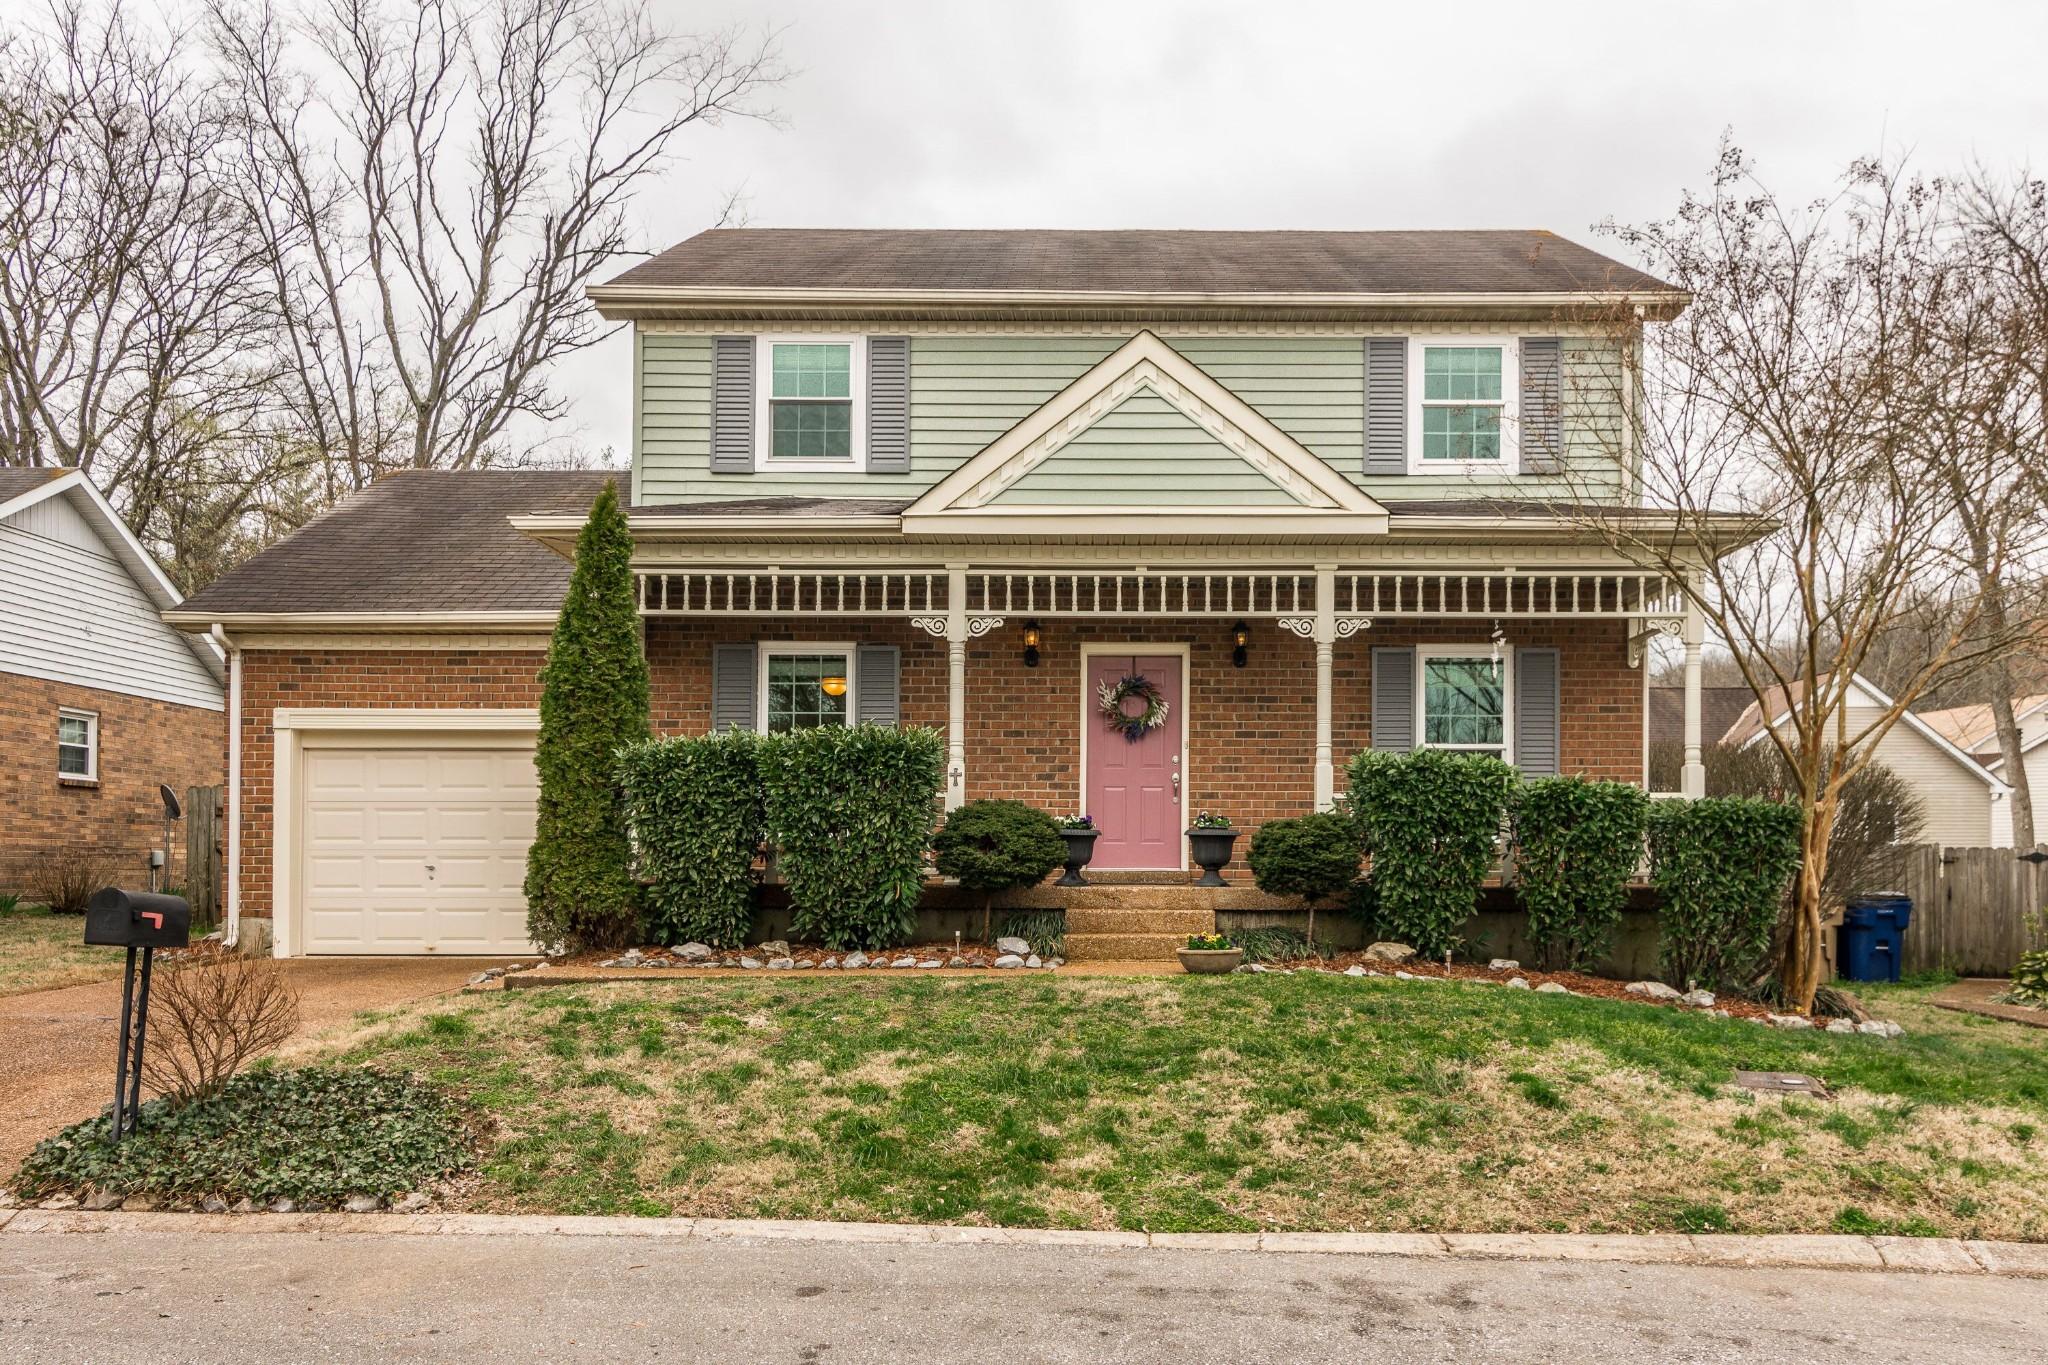 111 Dorchester Ct, Goodlettsville, TN 37072 - Goodlettsville, TN real estate listing